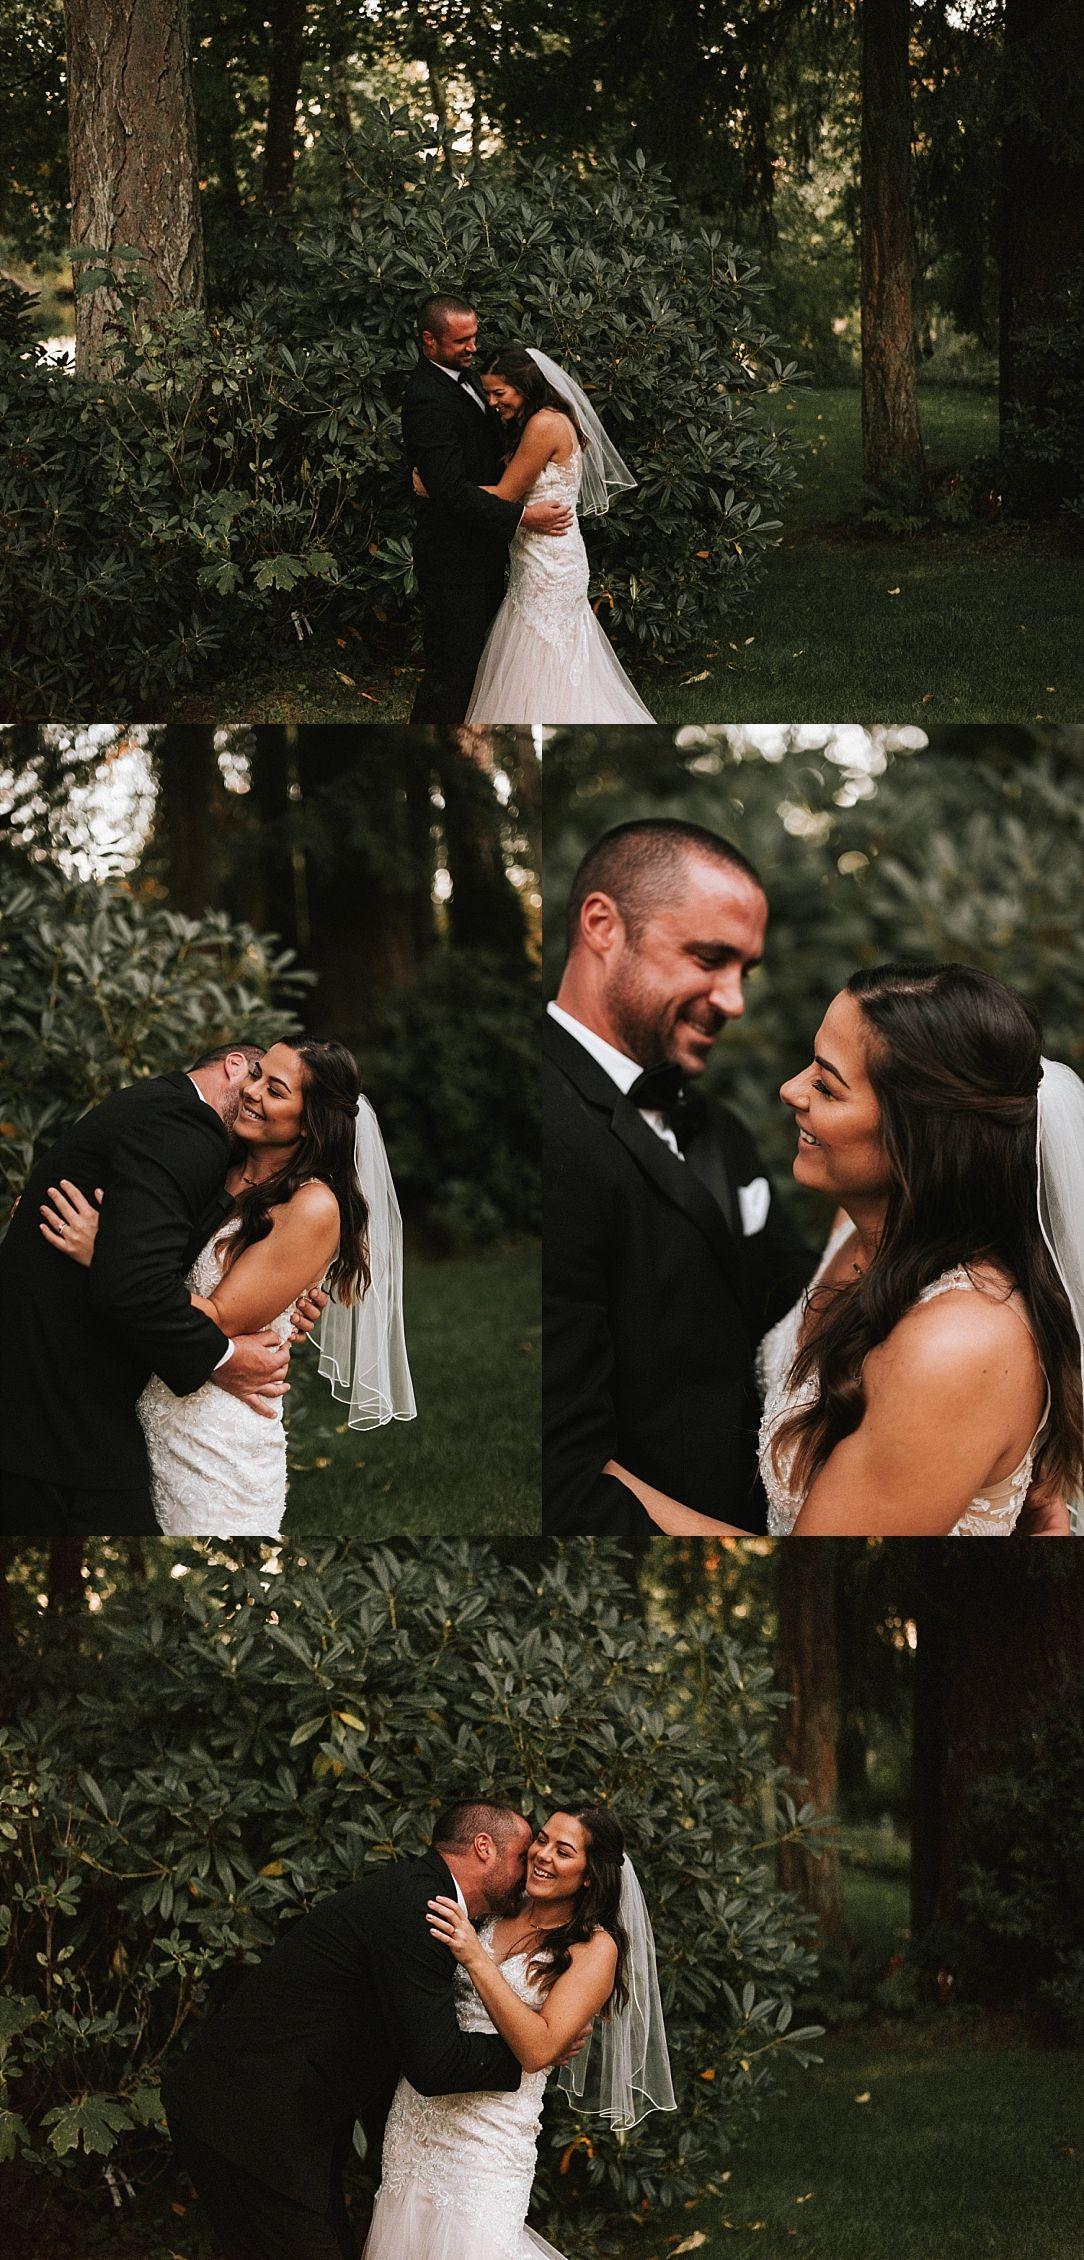 romantic oregon backyard wedding | Romantic backyard ...